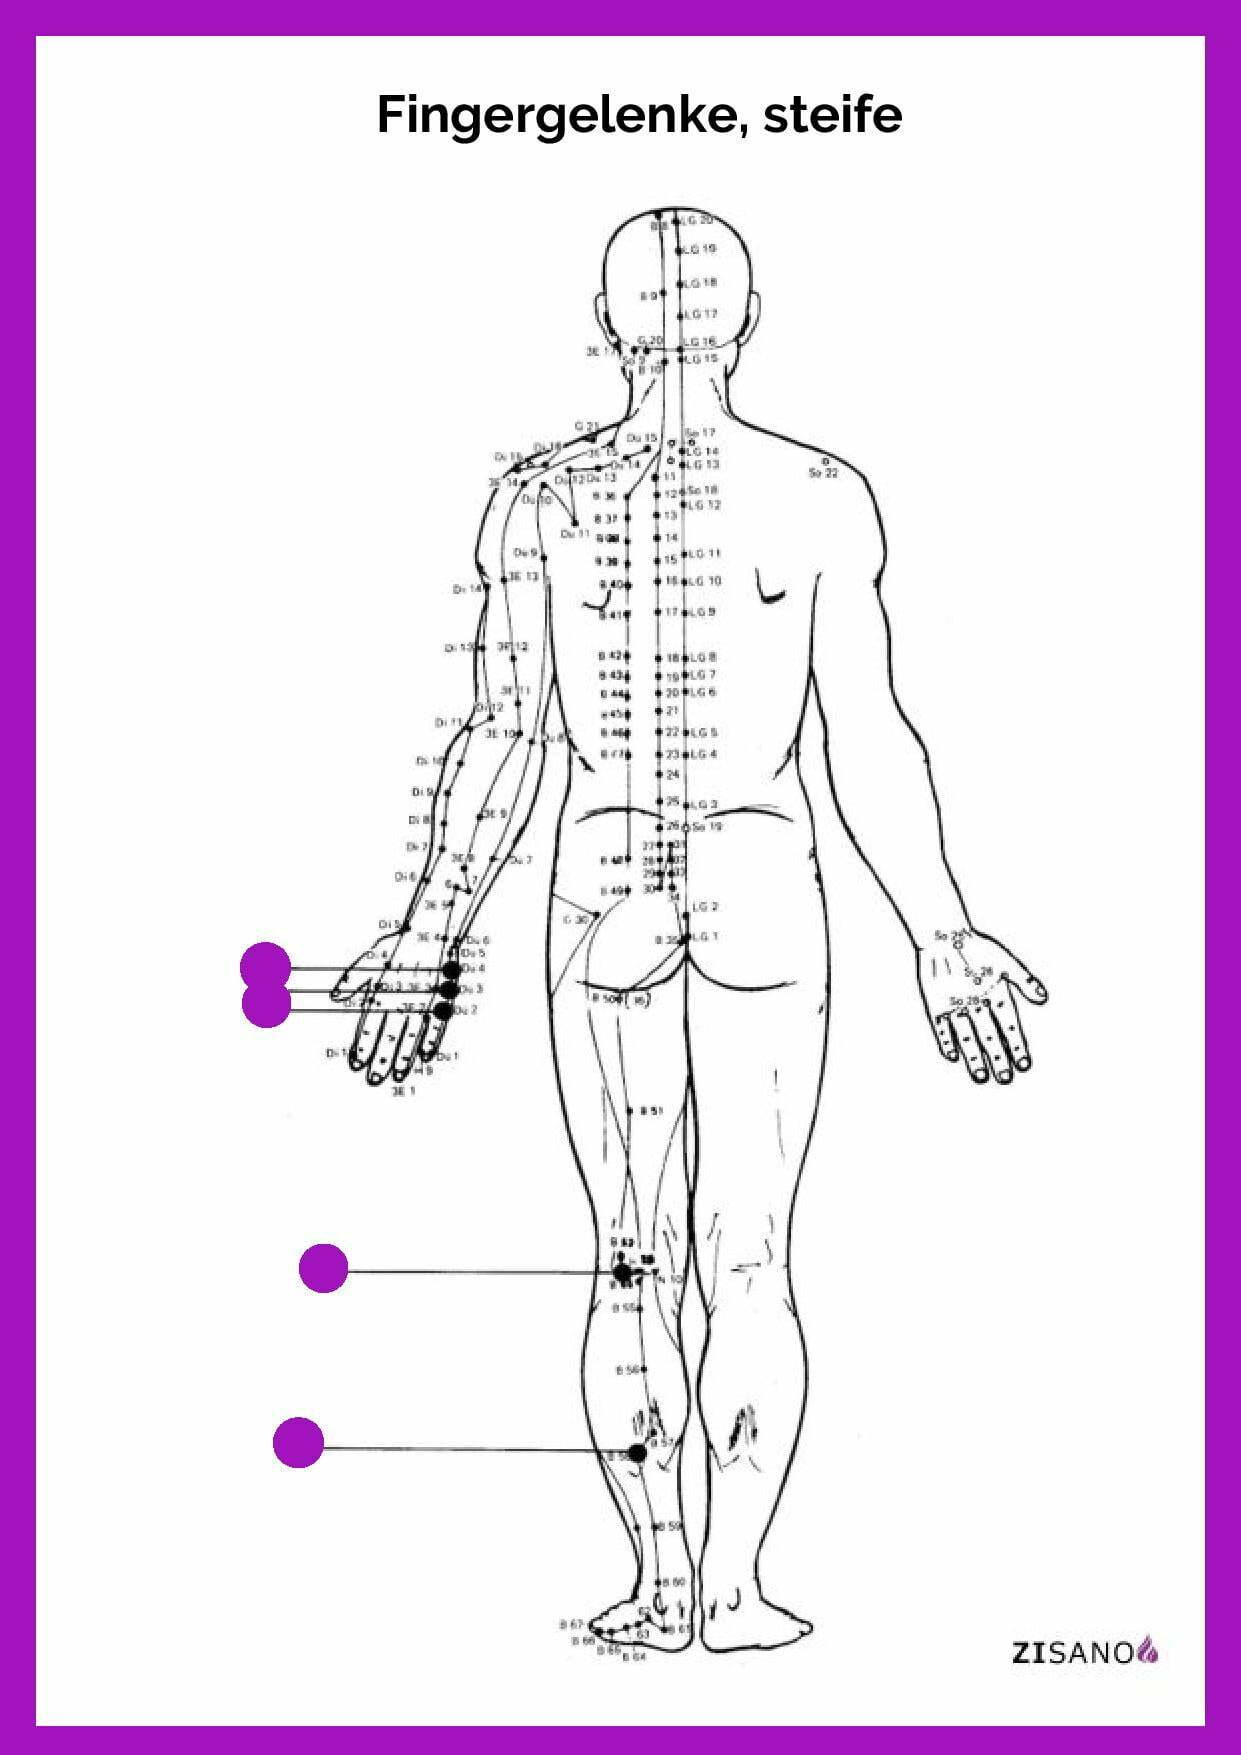 Meridiane - Fingergelenke, steife- Behandlung